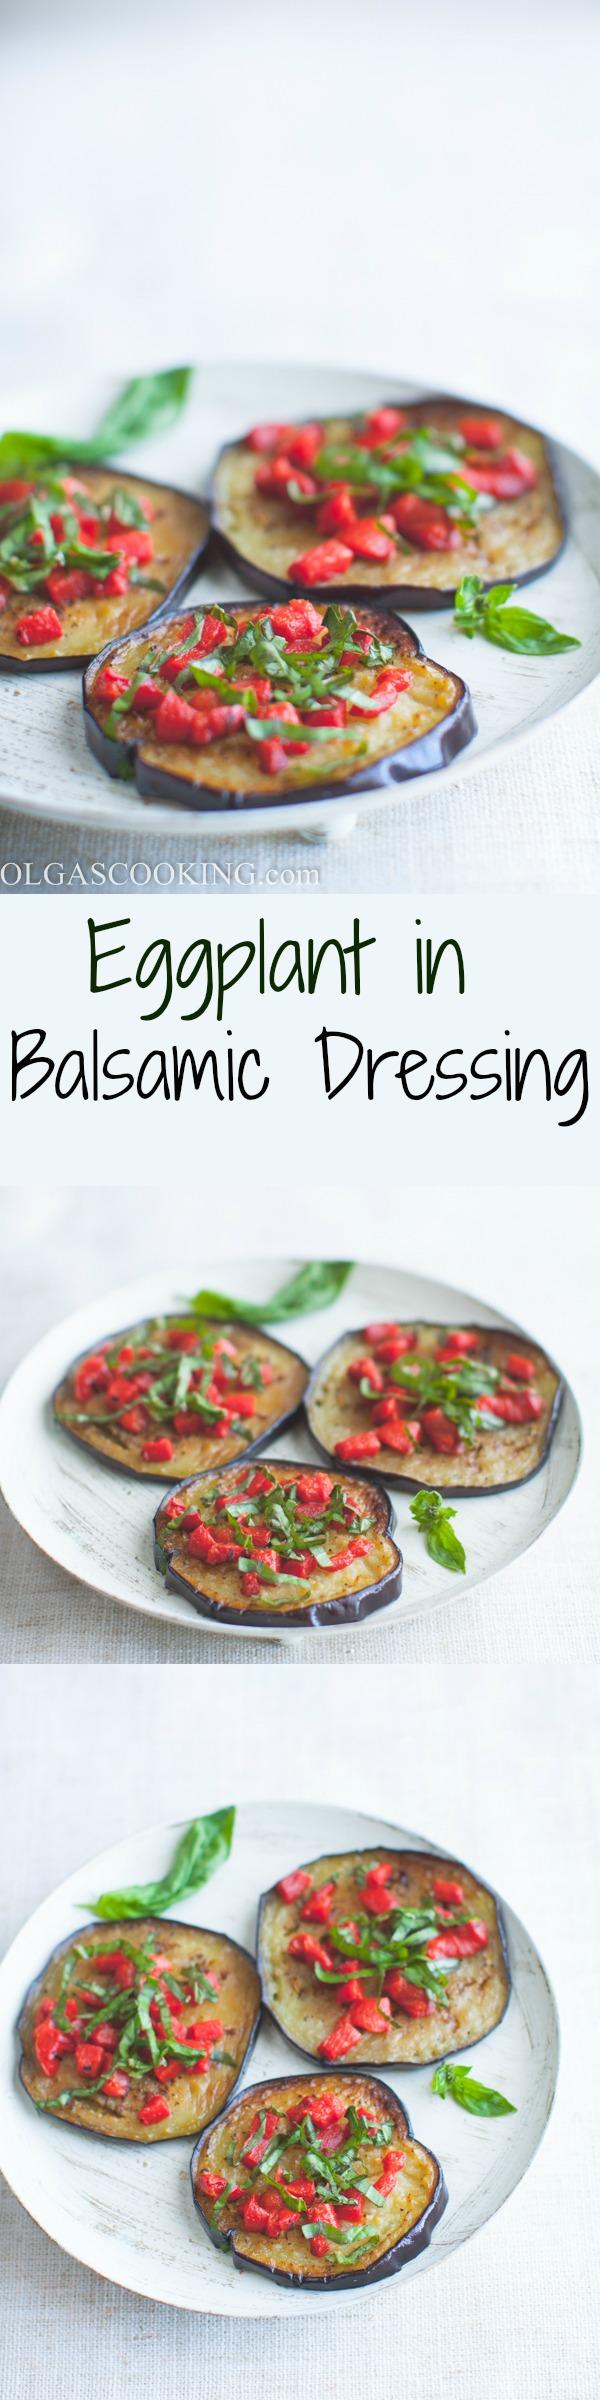 Eggplant in Balsamic Vinegar...easy and yummy side dish